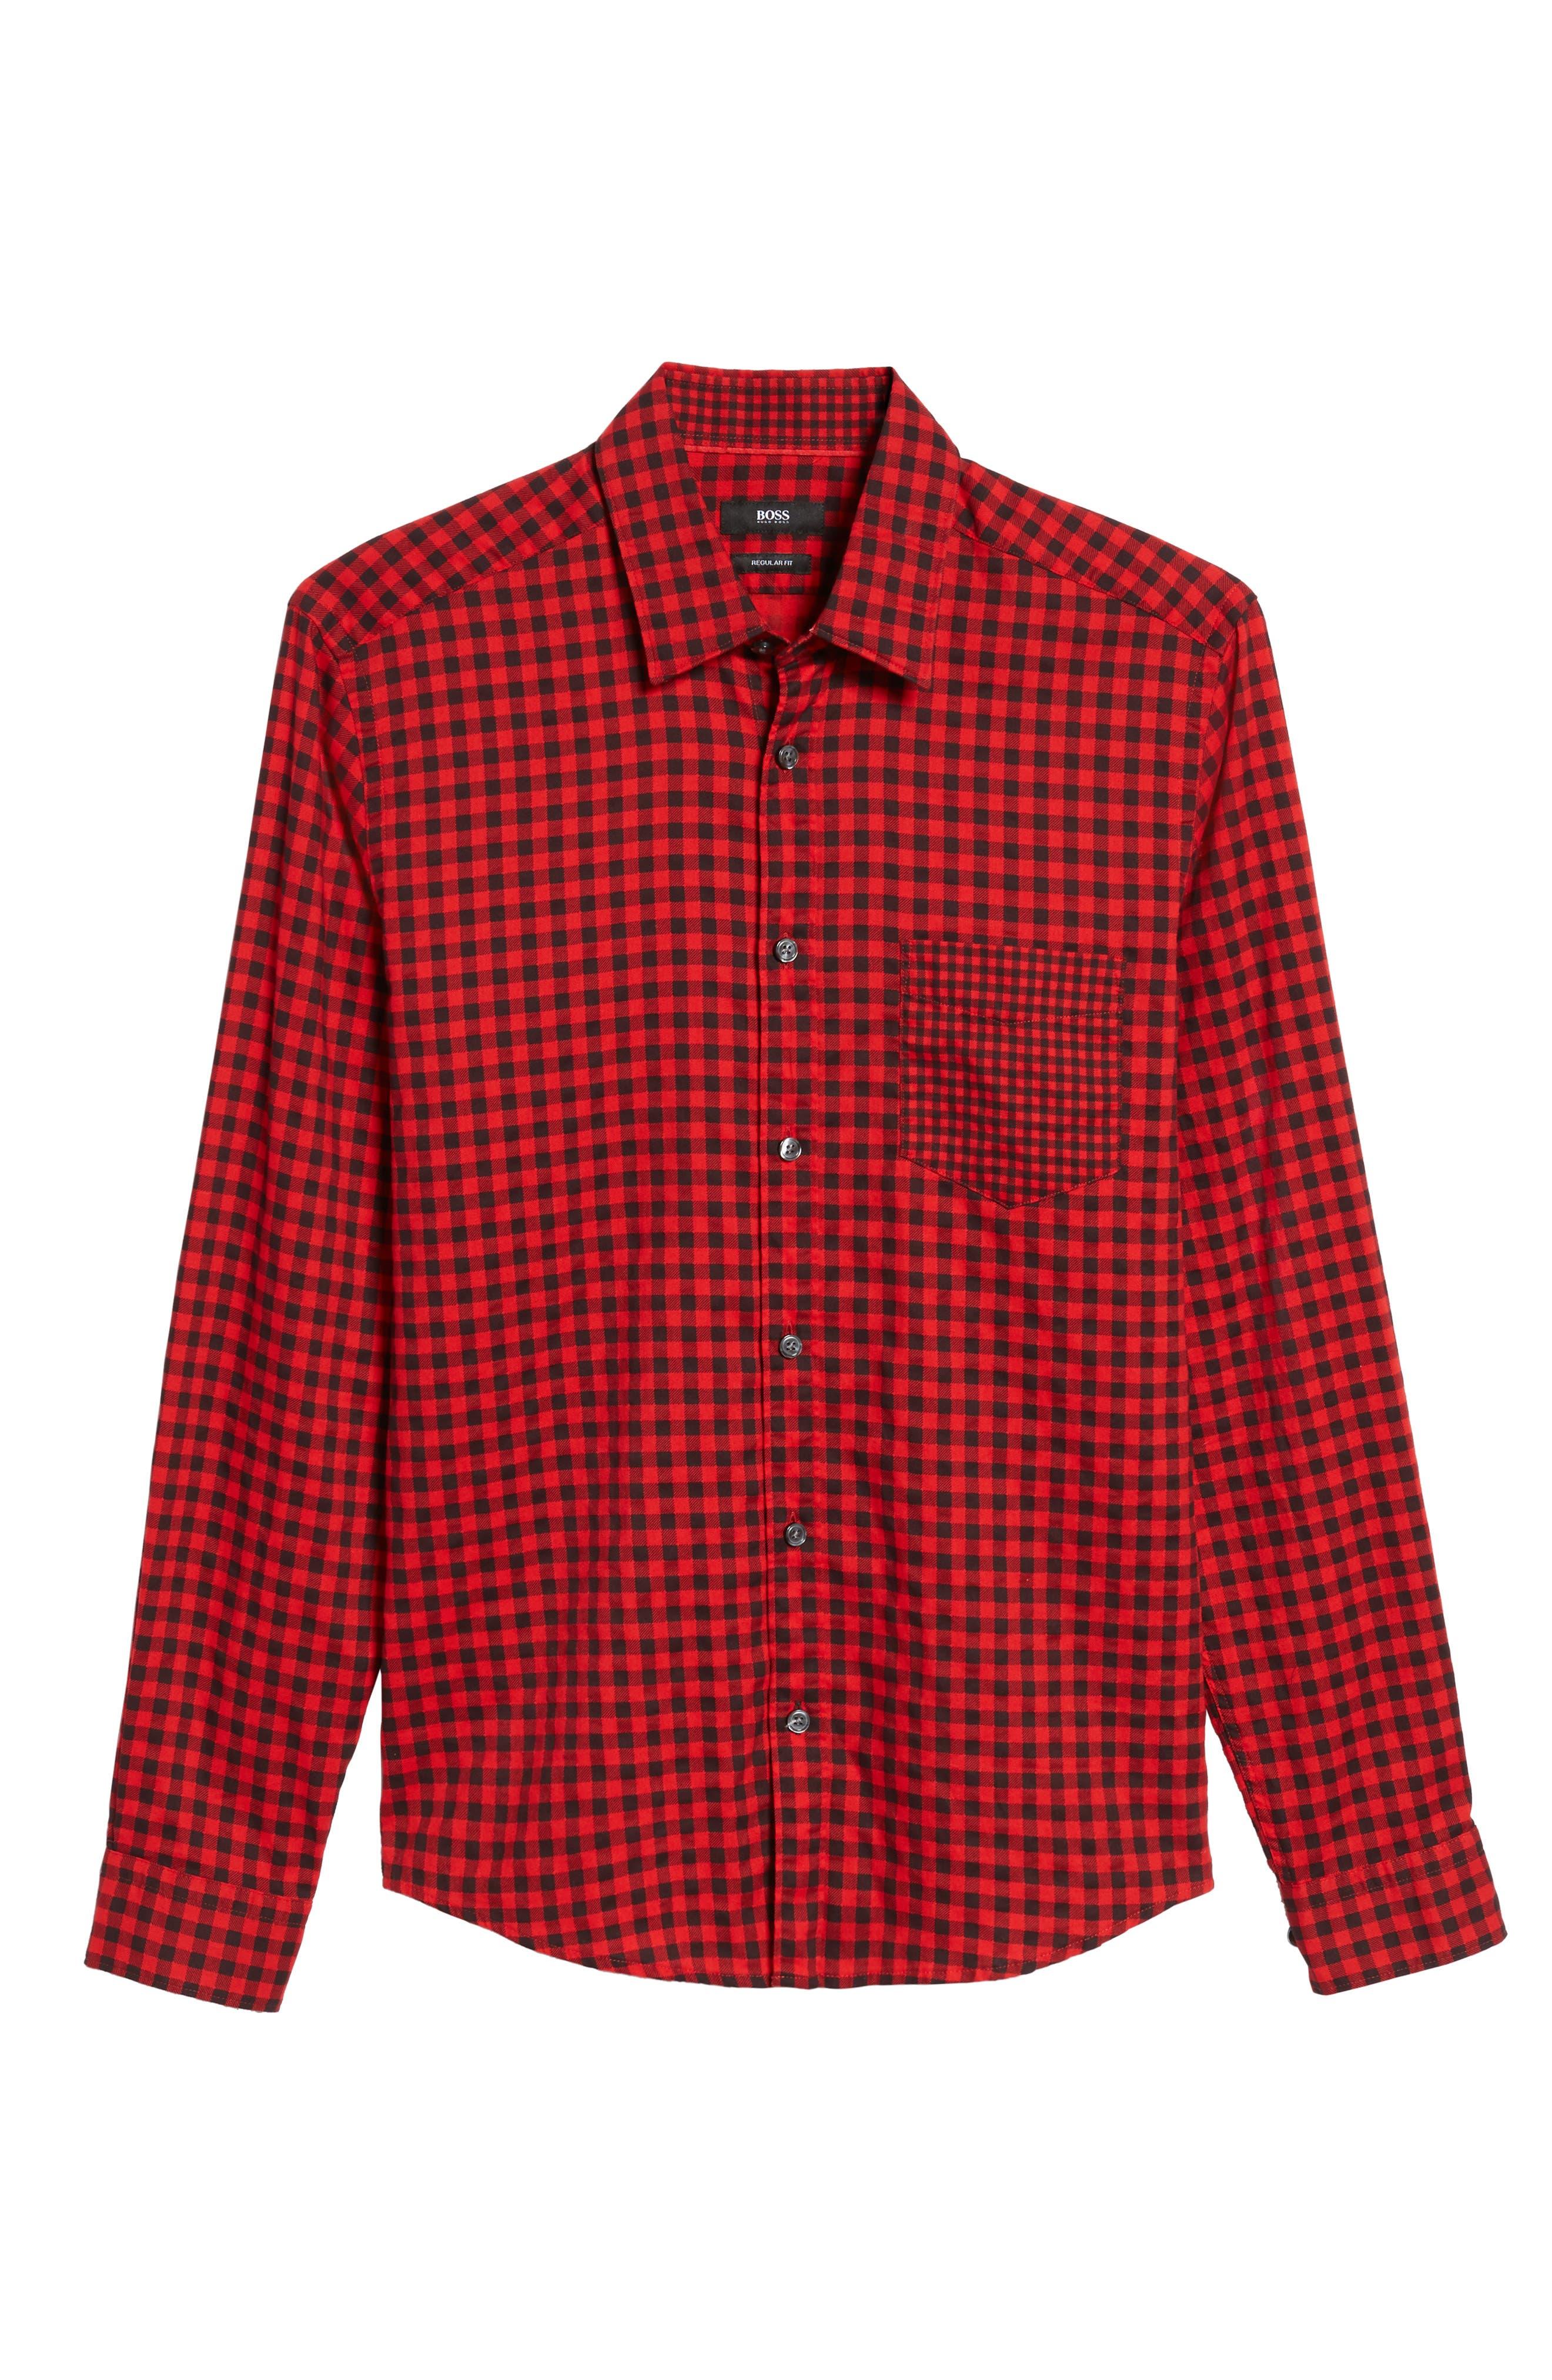 Lance Regular Fit Gingham Check Twill Sport Shirt,                             Alternate thumbnail 6, color,                             623